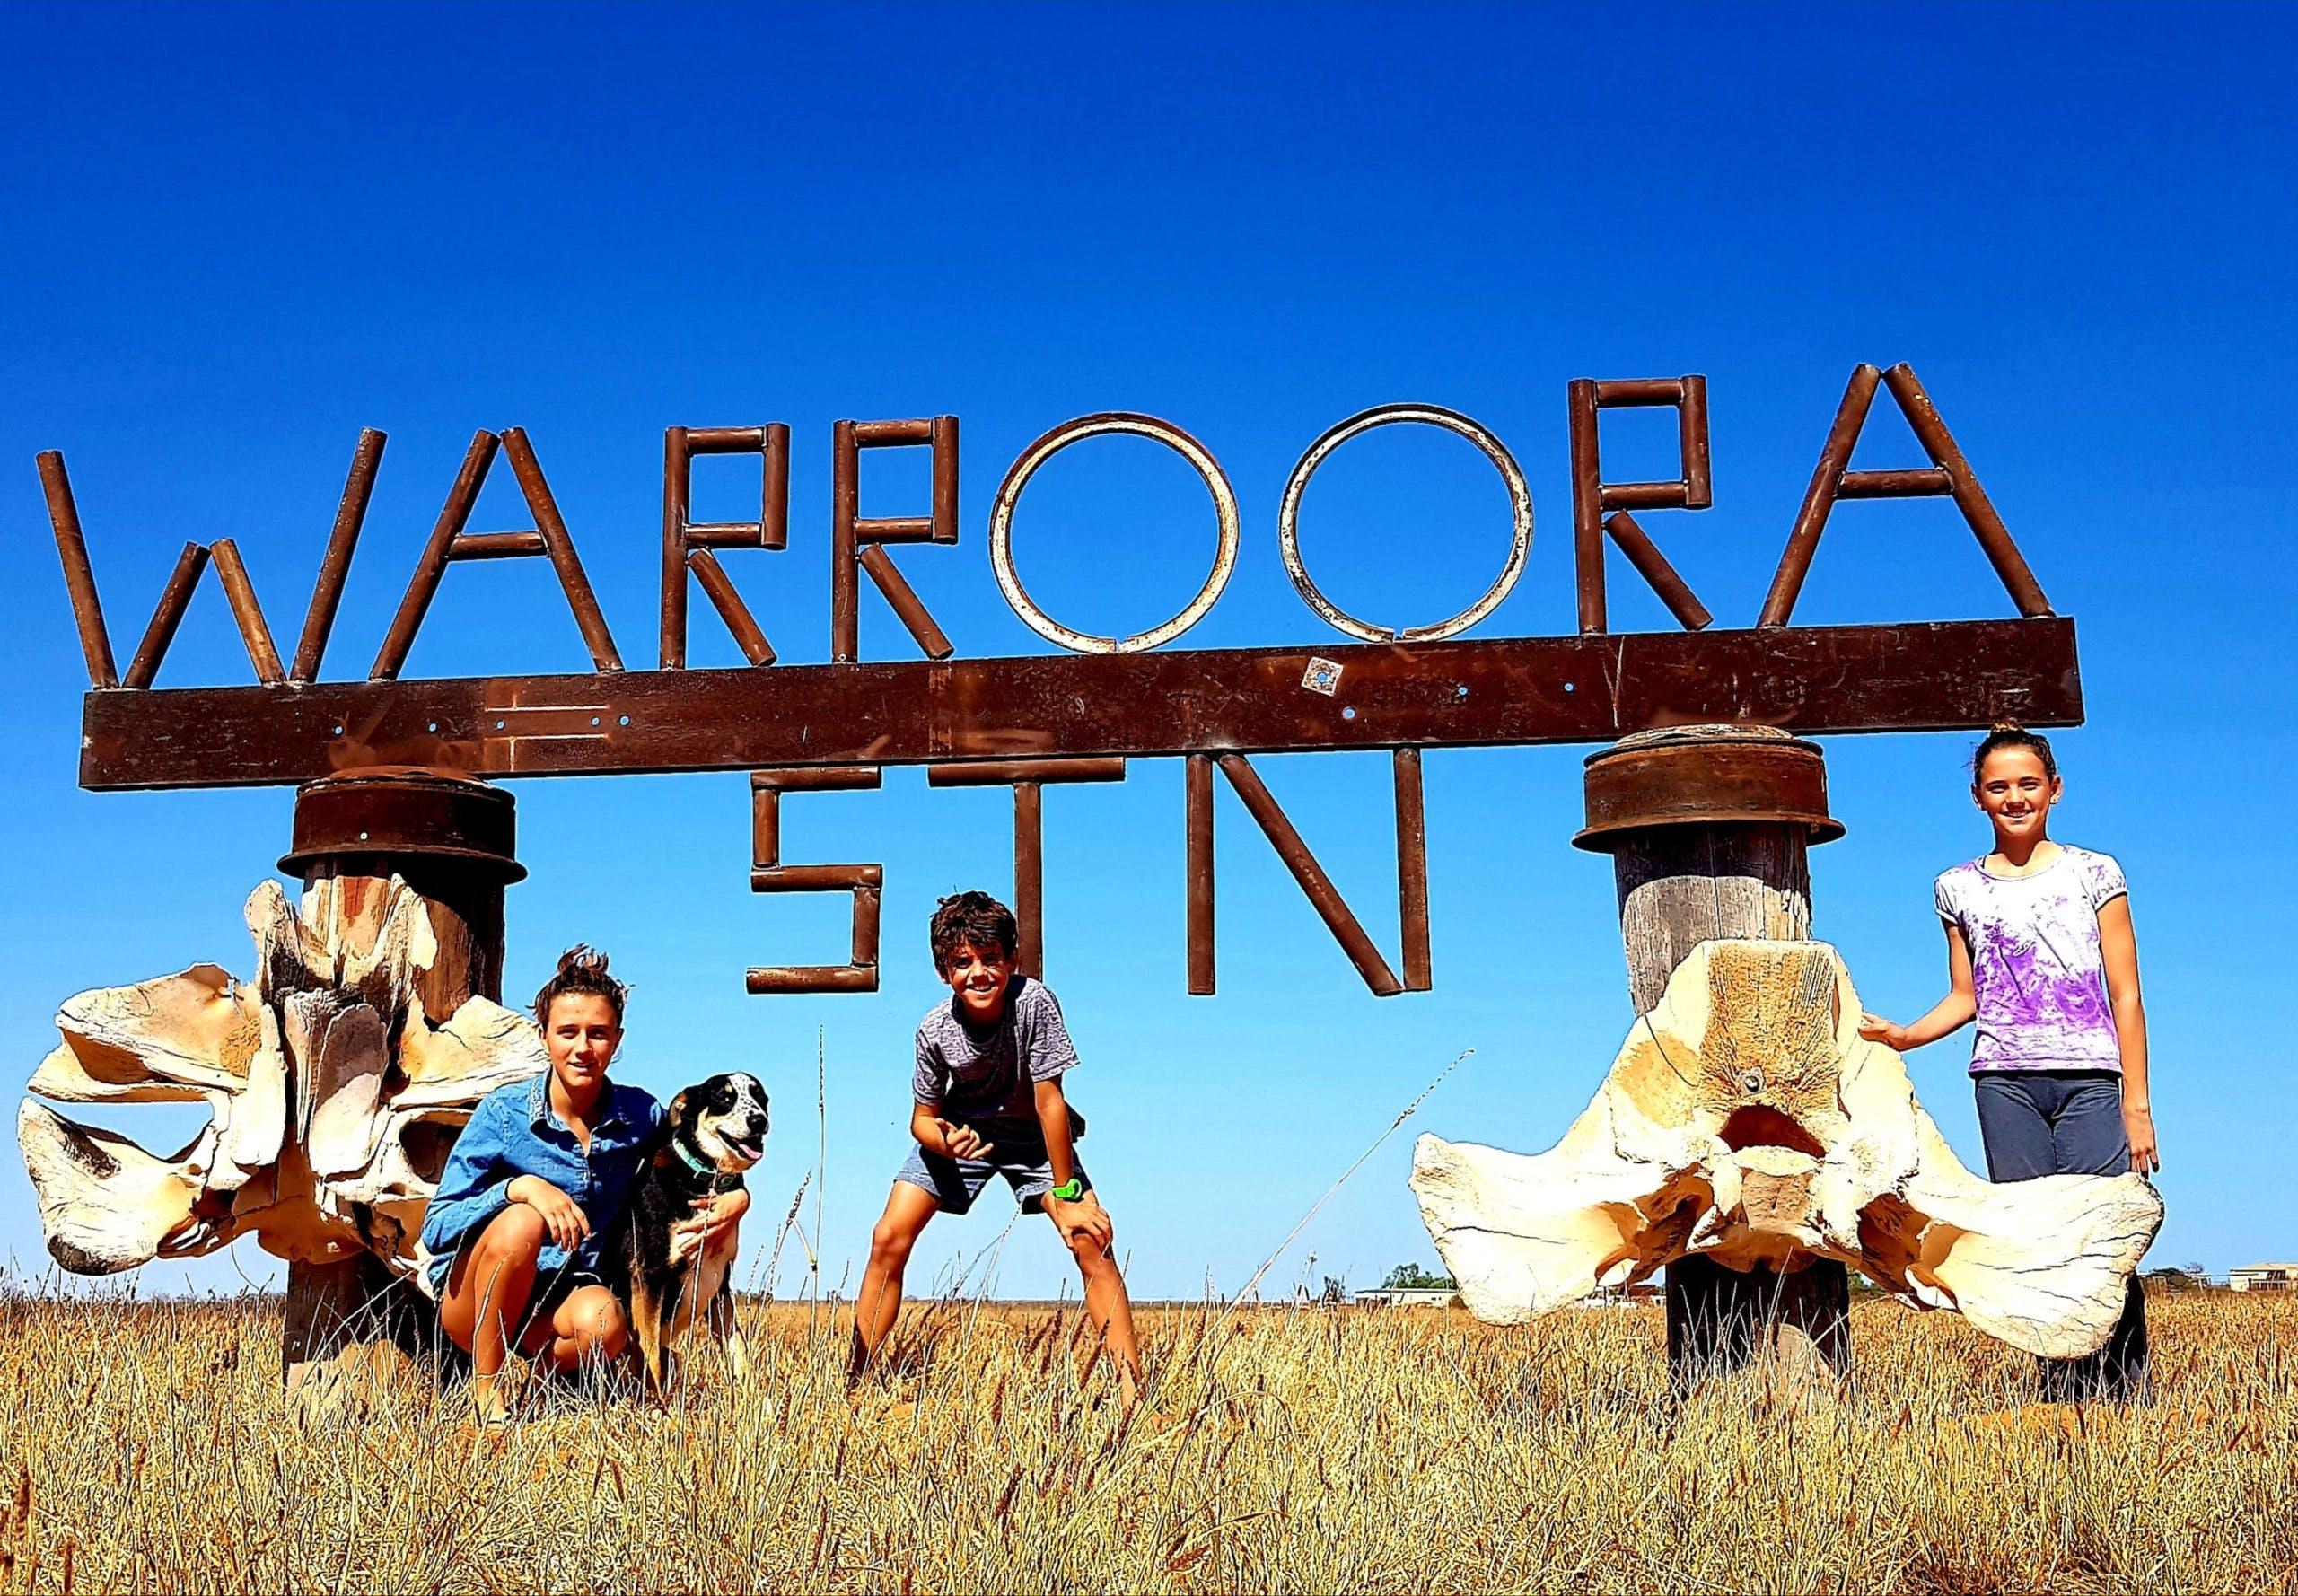 Warroora Station Blog 1